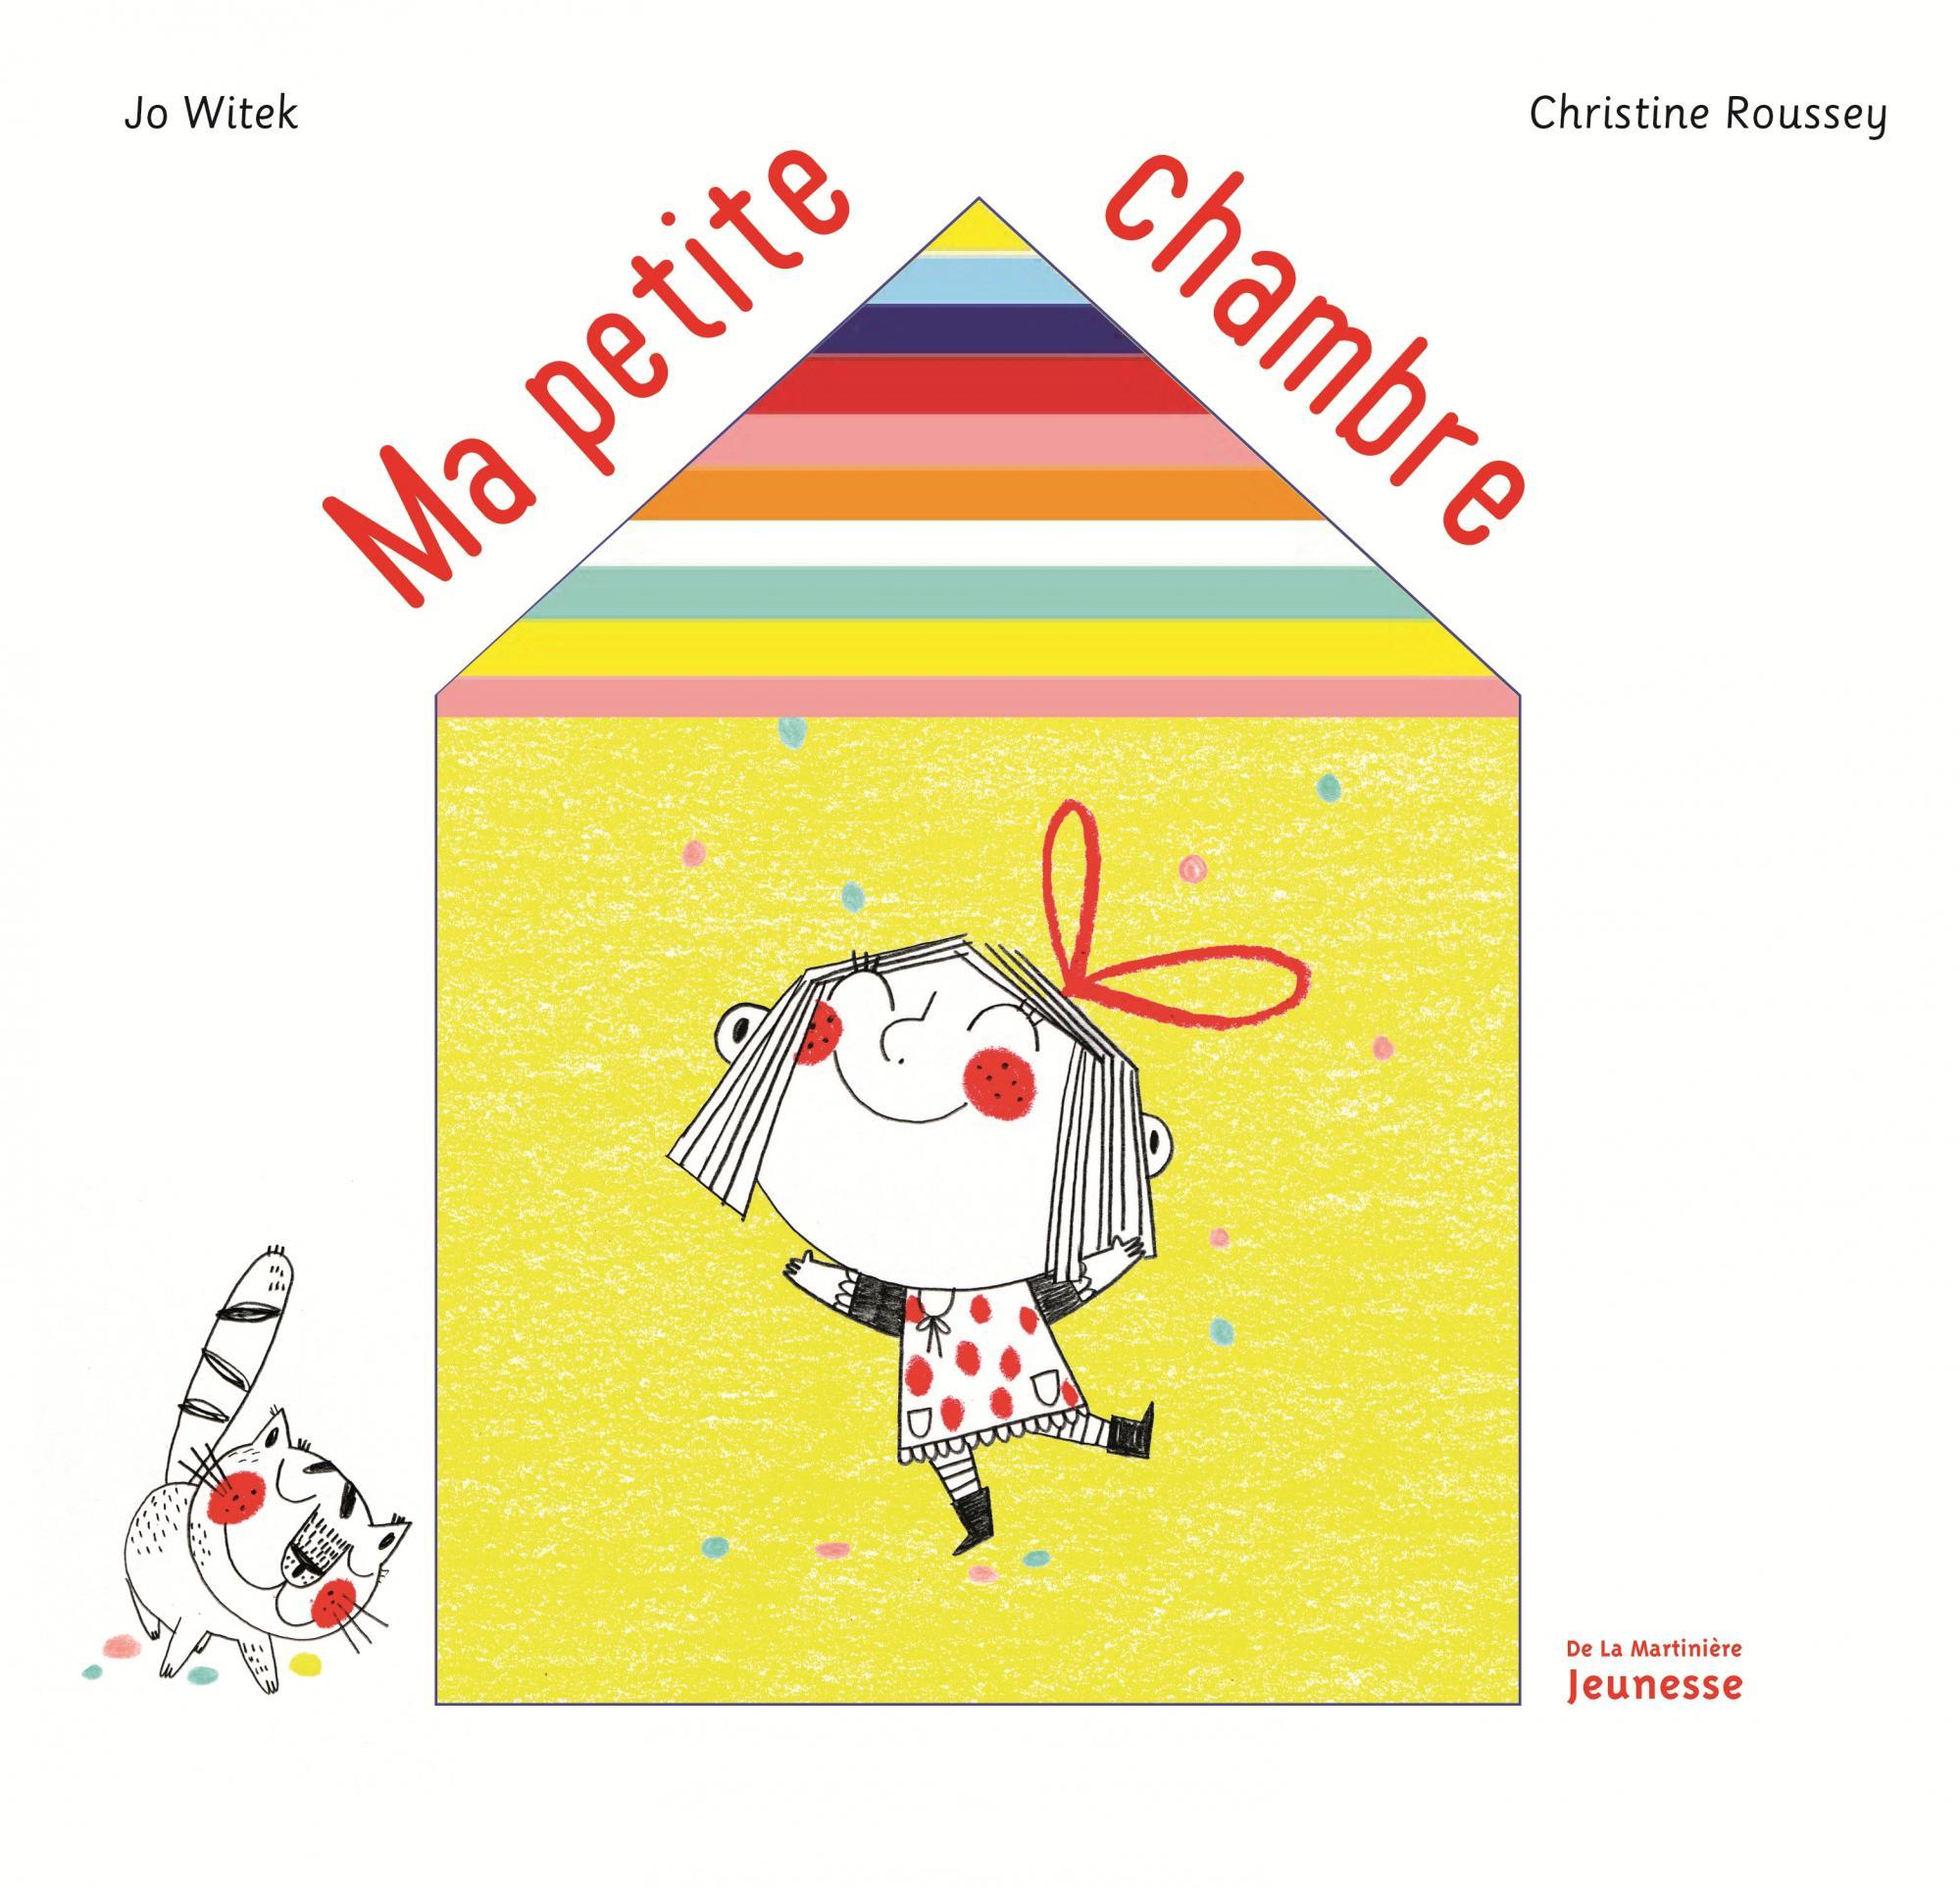 #BBB310 Ma Petite Chambre Jo Witek Editions De La Martinière  1171 avis ma petite chambre 1999x1927 px @ aertt.com